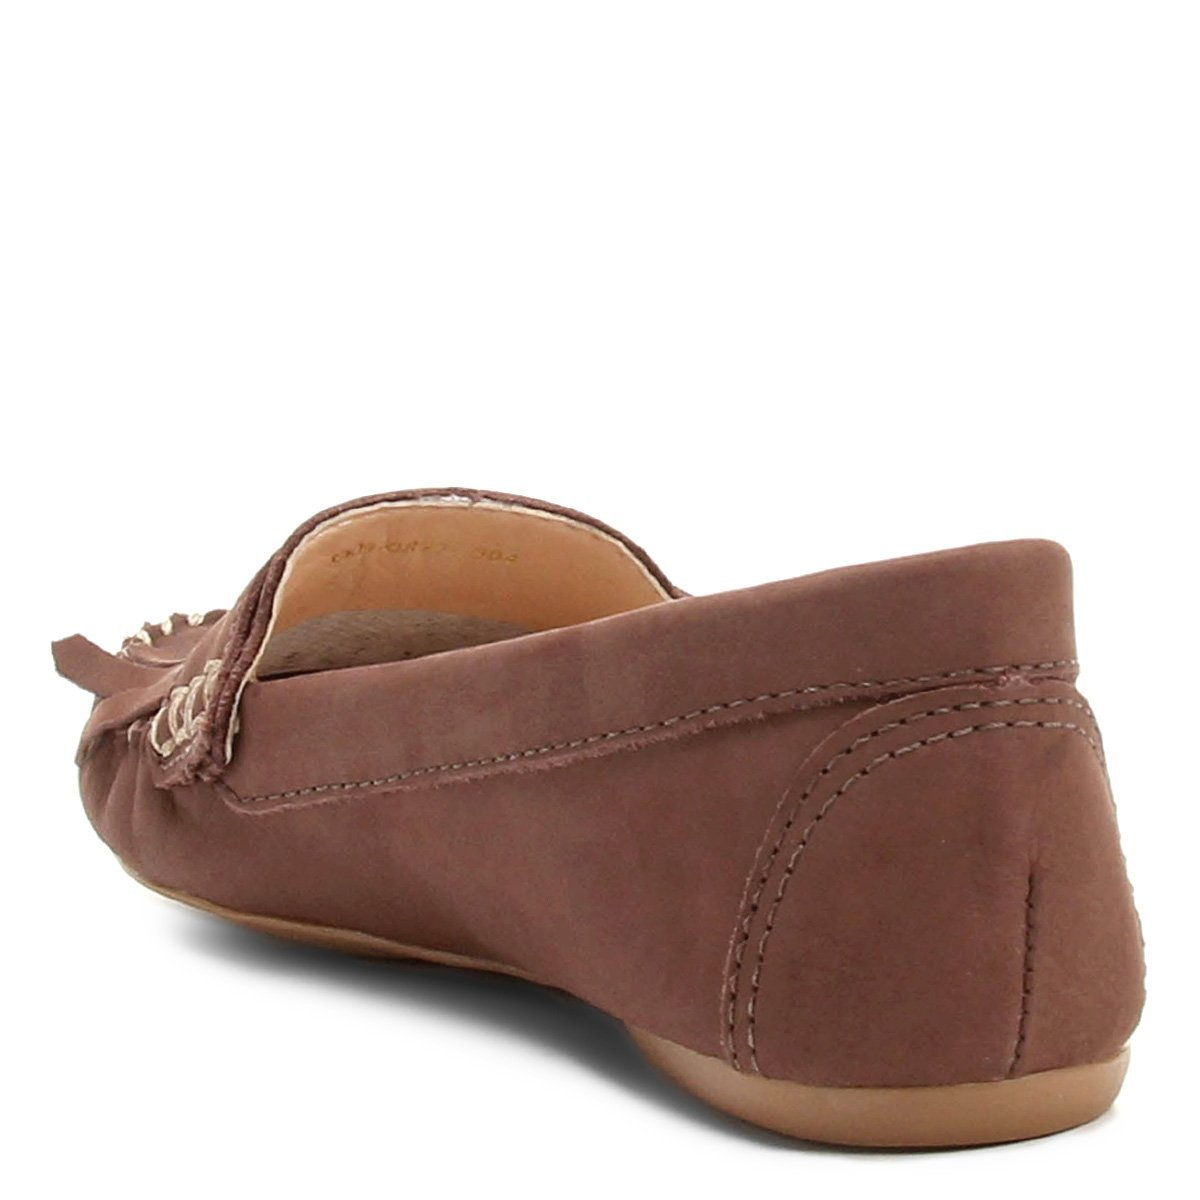 Franja Mocassim Feminino Bege Couro Shoestock Barbicachos Couro Mocassim xIHIrPq4